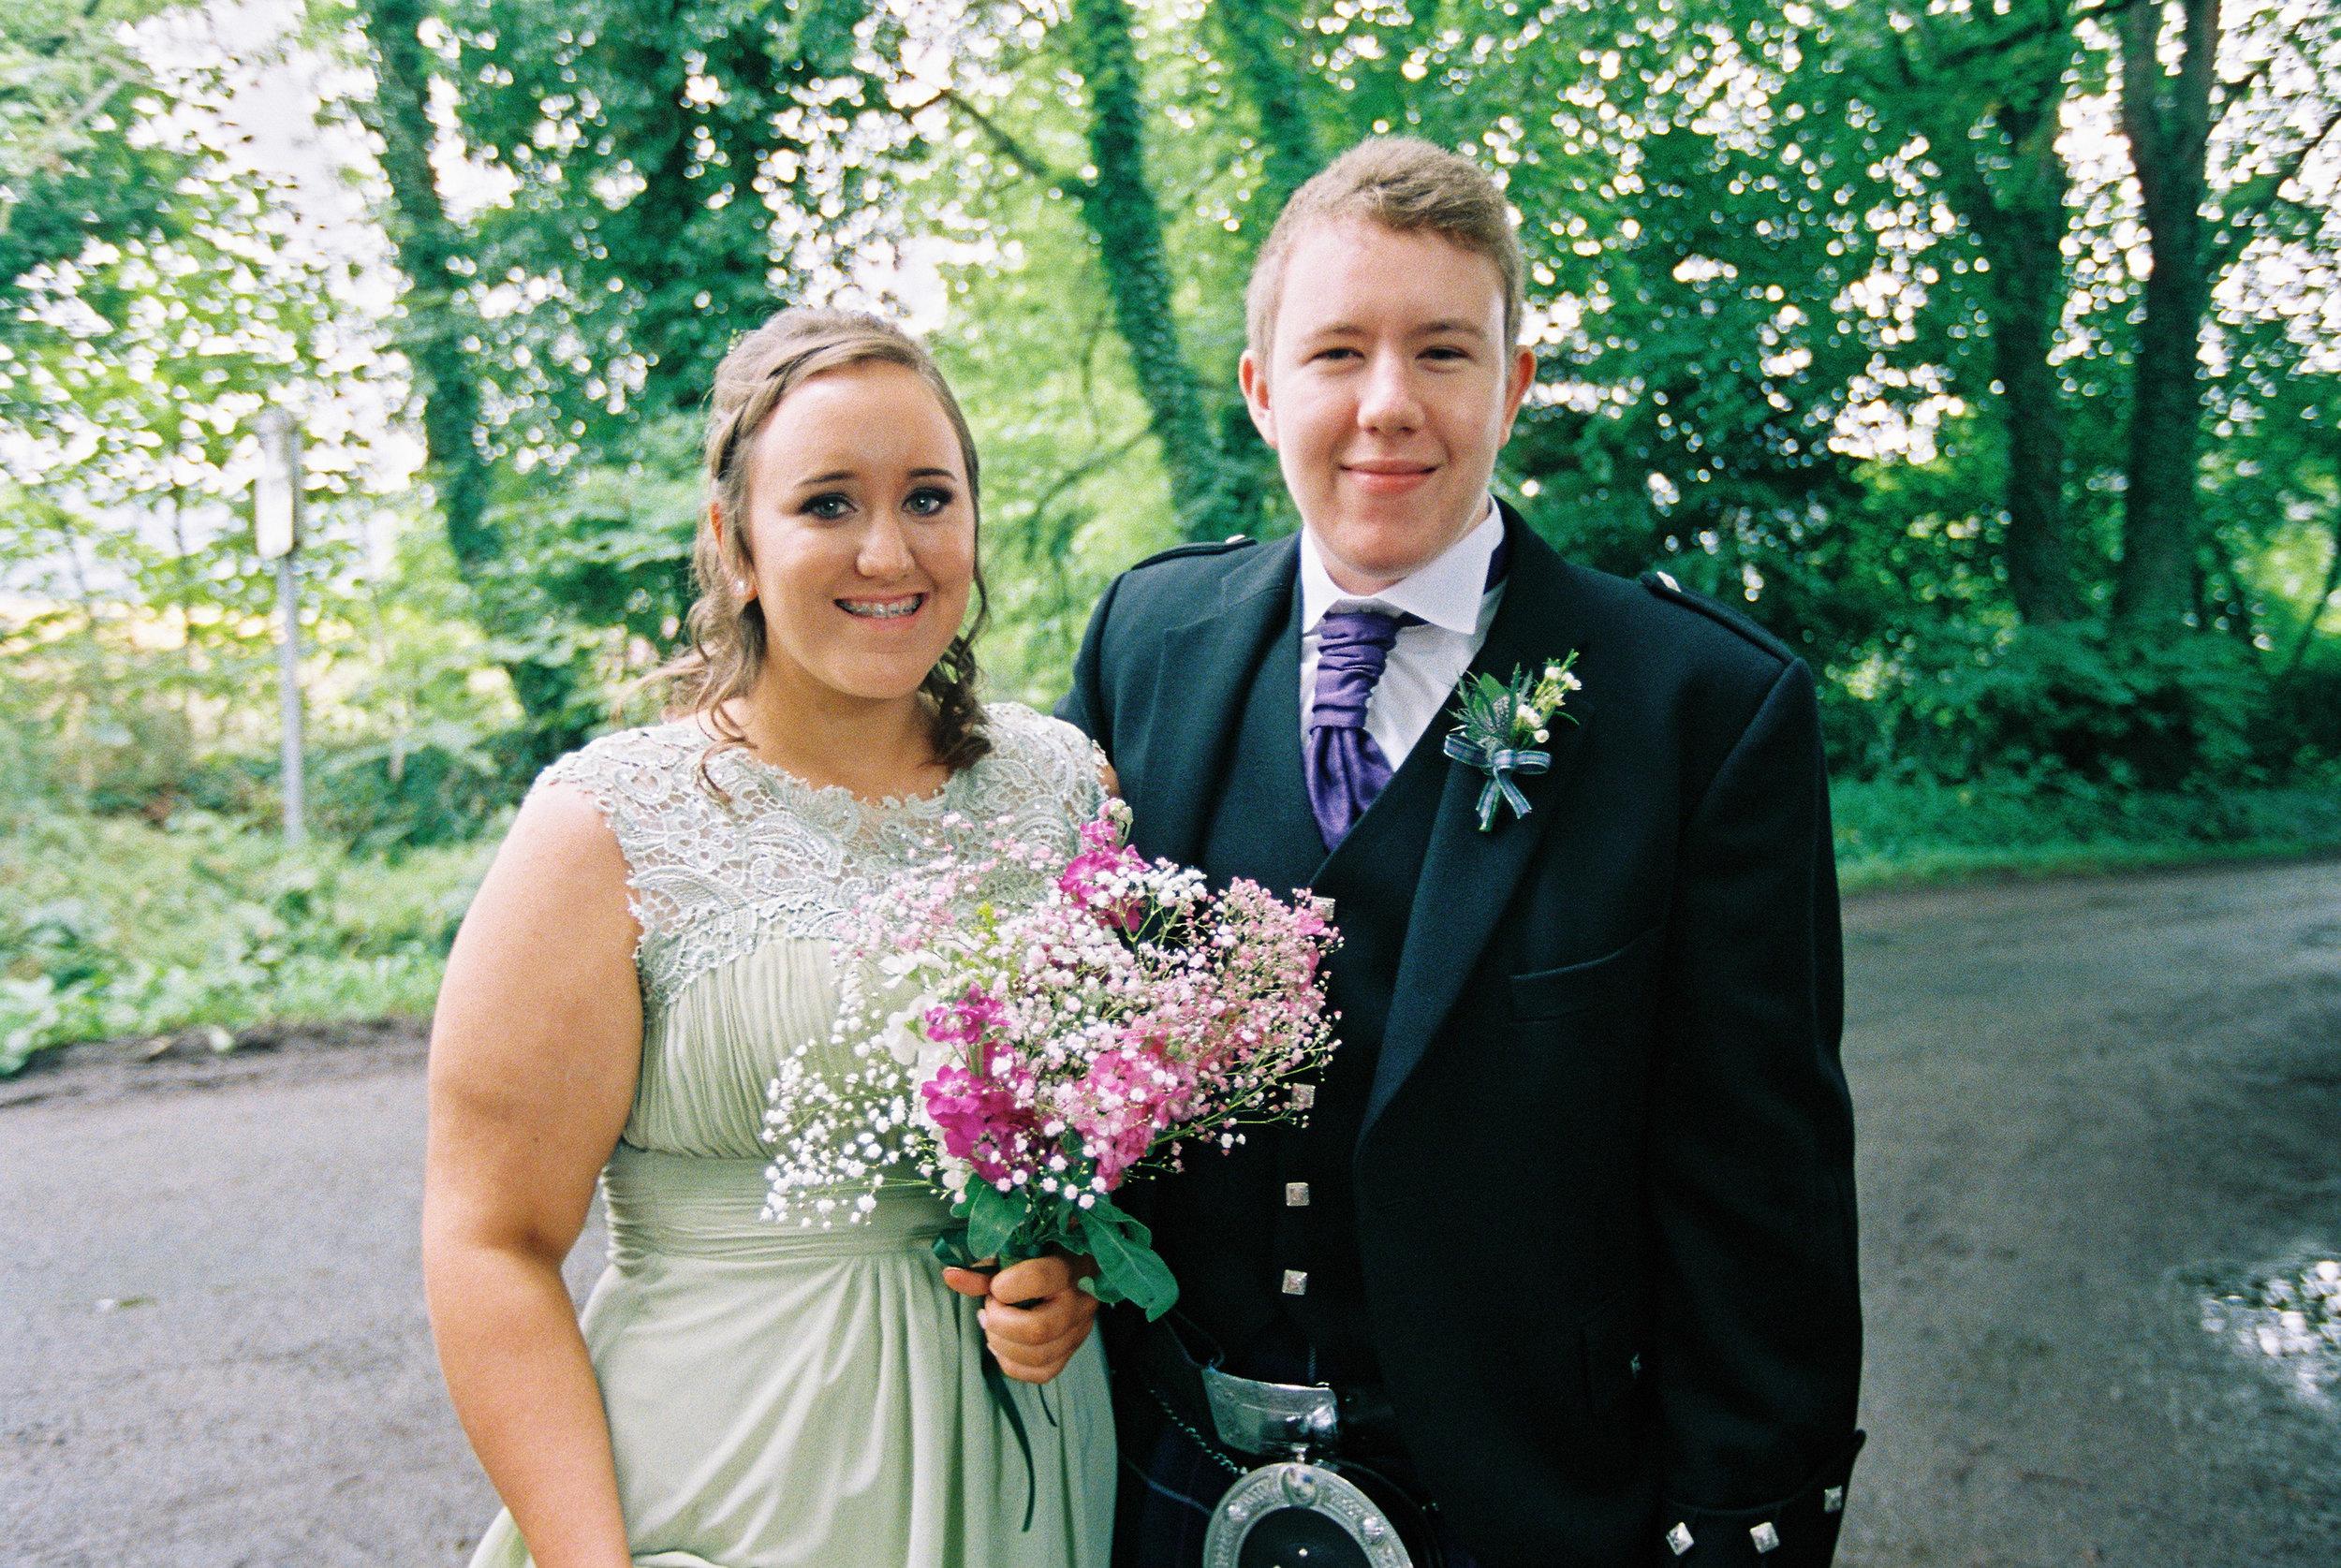 wedding-photography-scotland358.jpg